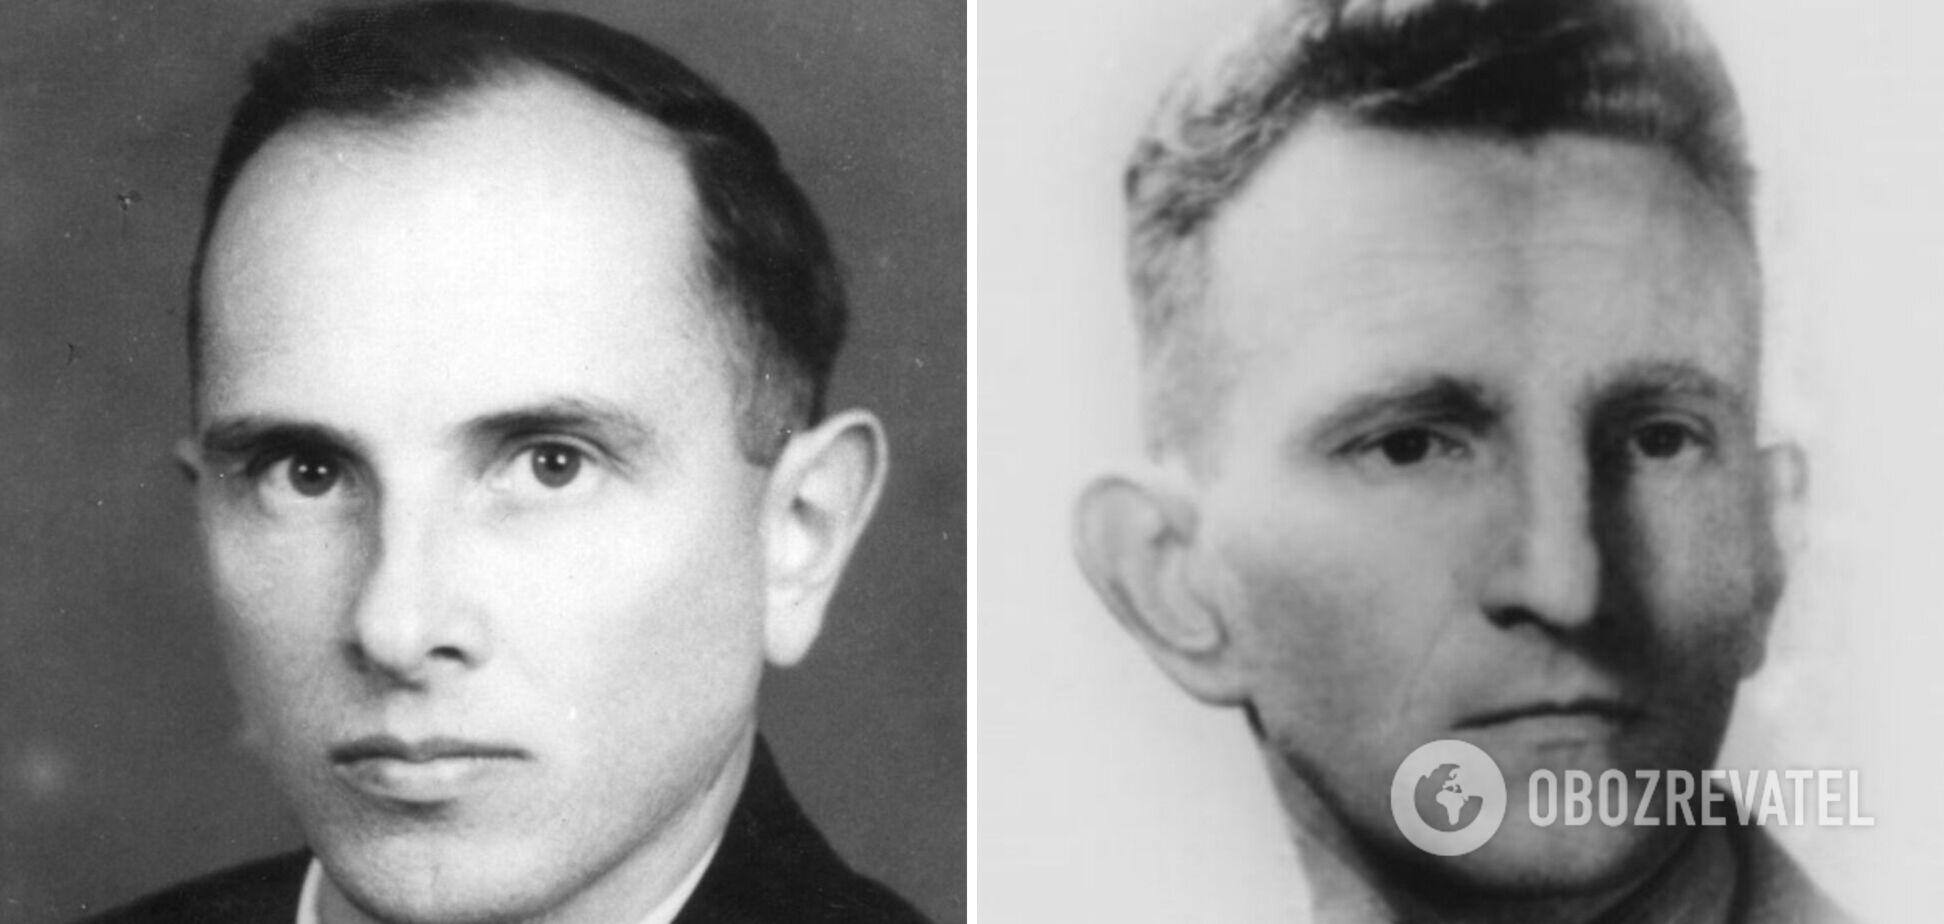 Лідери ОУН та УПА Степан Бандера та Роман Шухевич